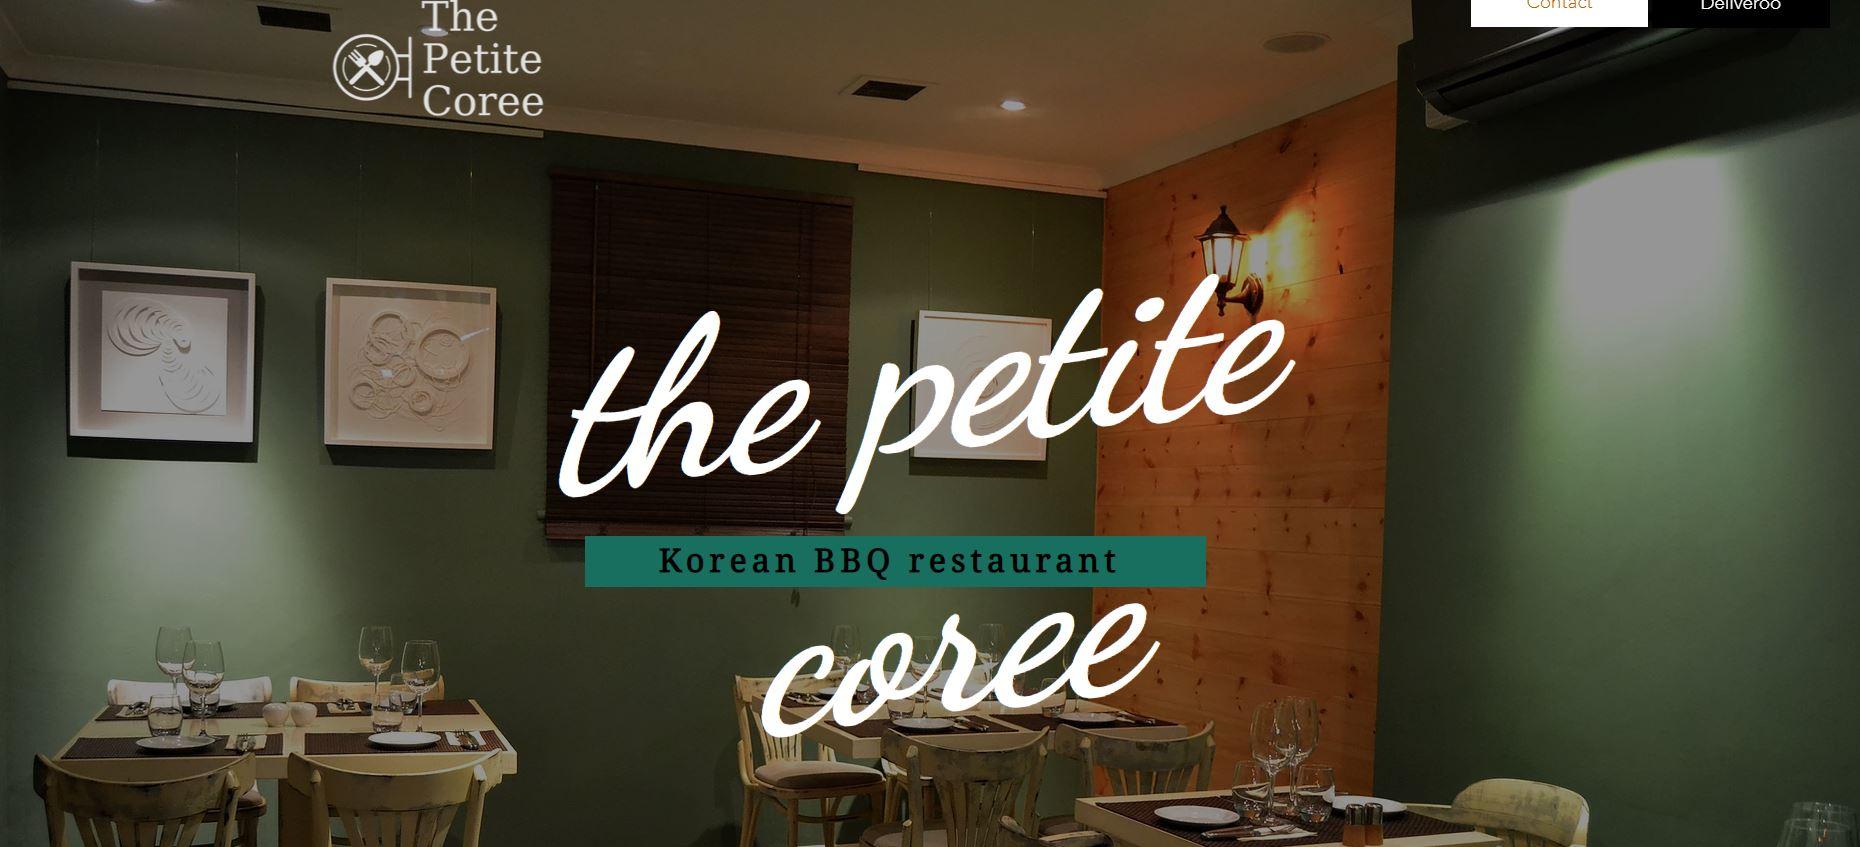 The Petite Coree